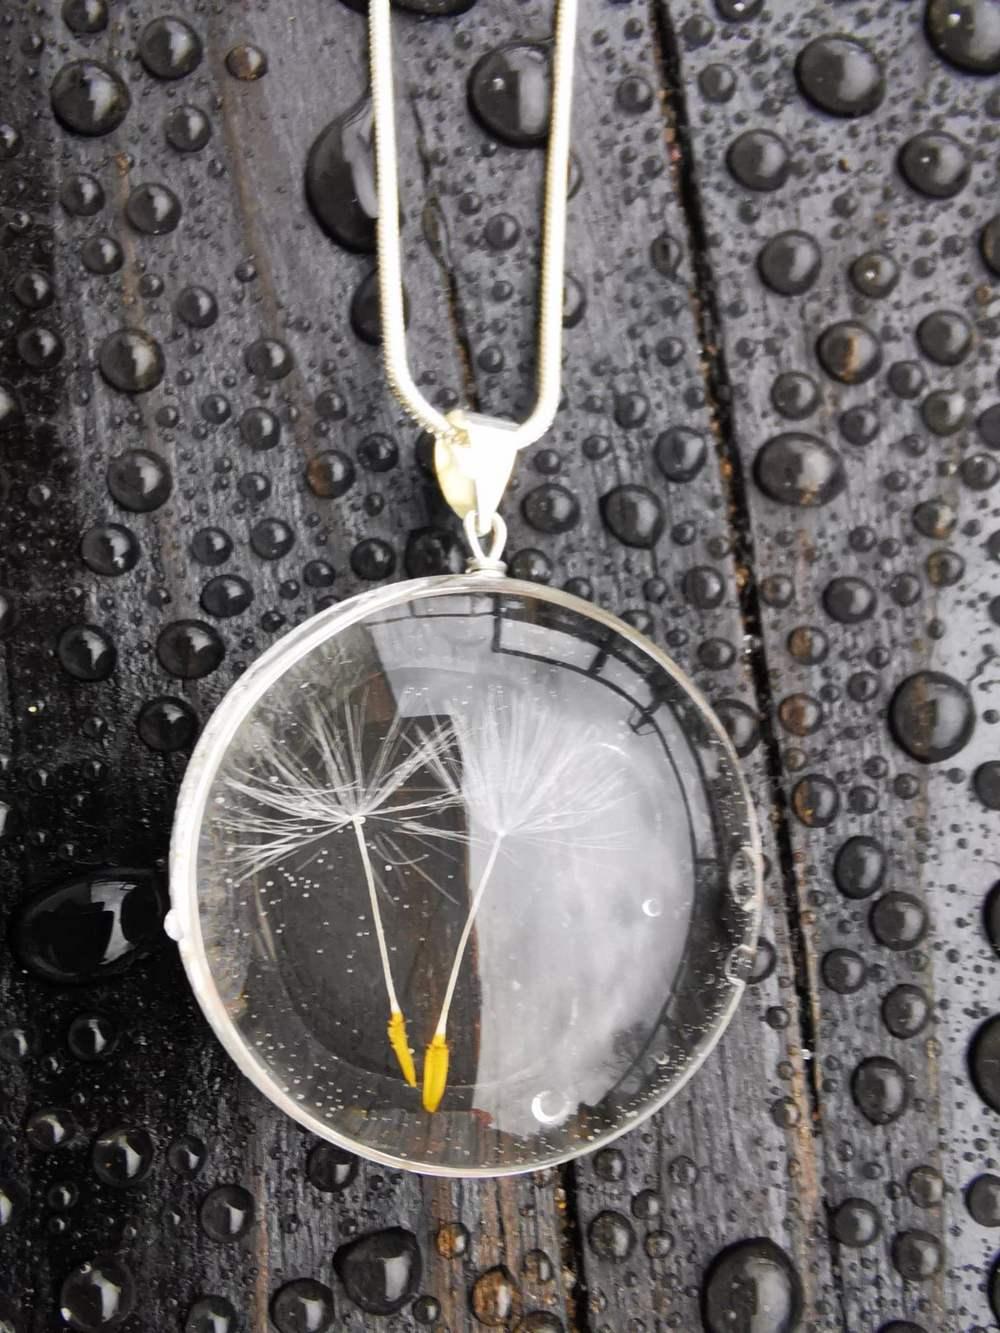 Daili Jewelry glass glasjewelry designer designerjewelry (8)